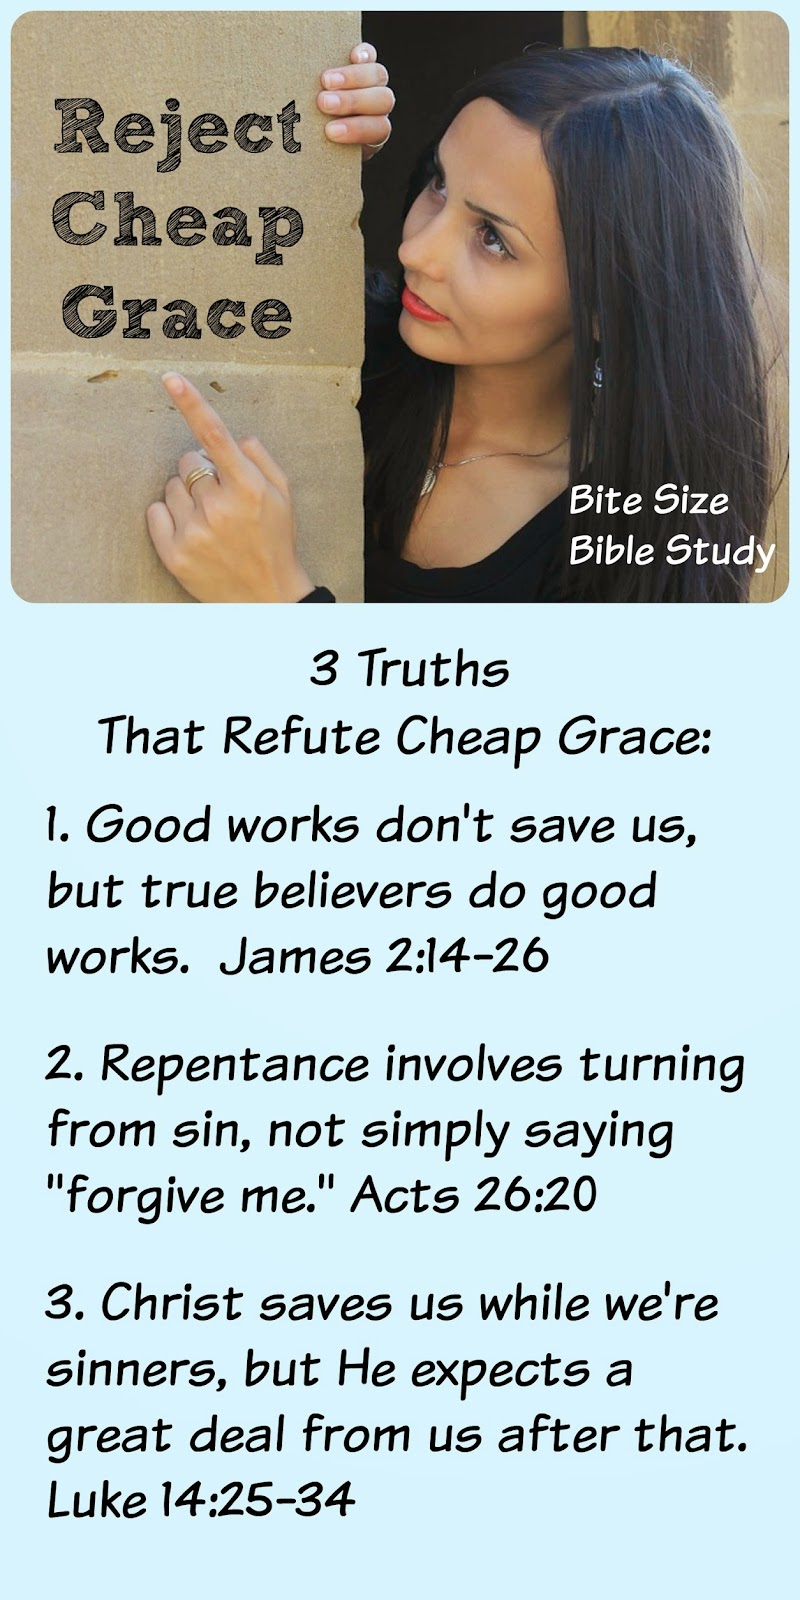 New Christian Ideas: Repentance - New Christian Bible Study